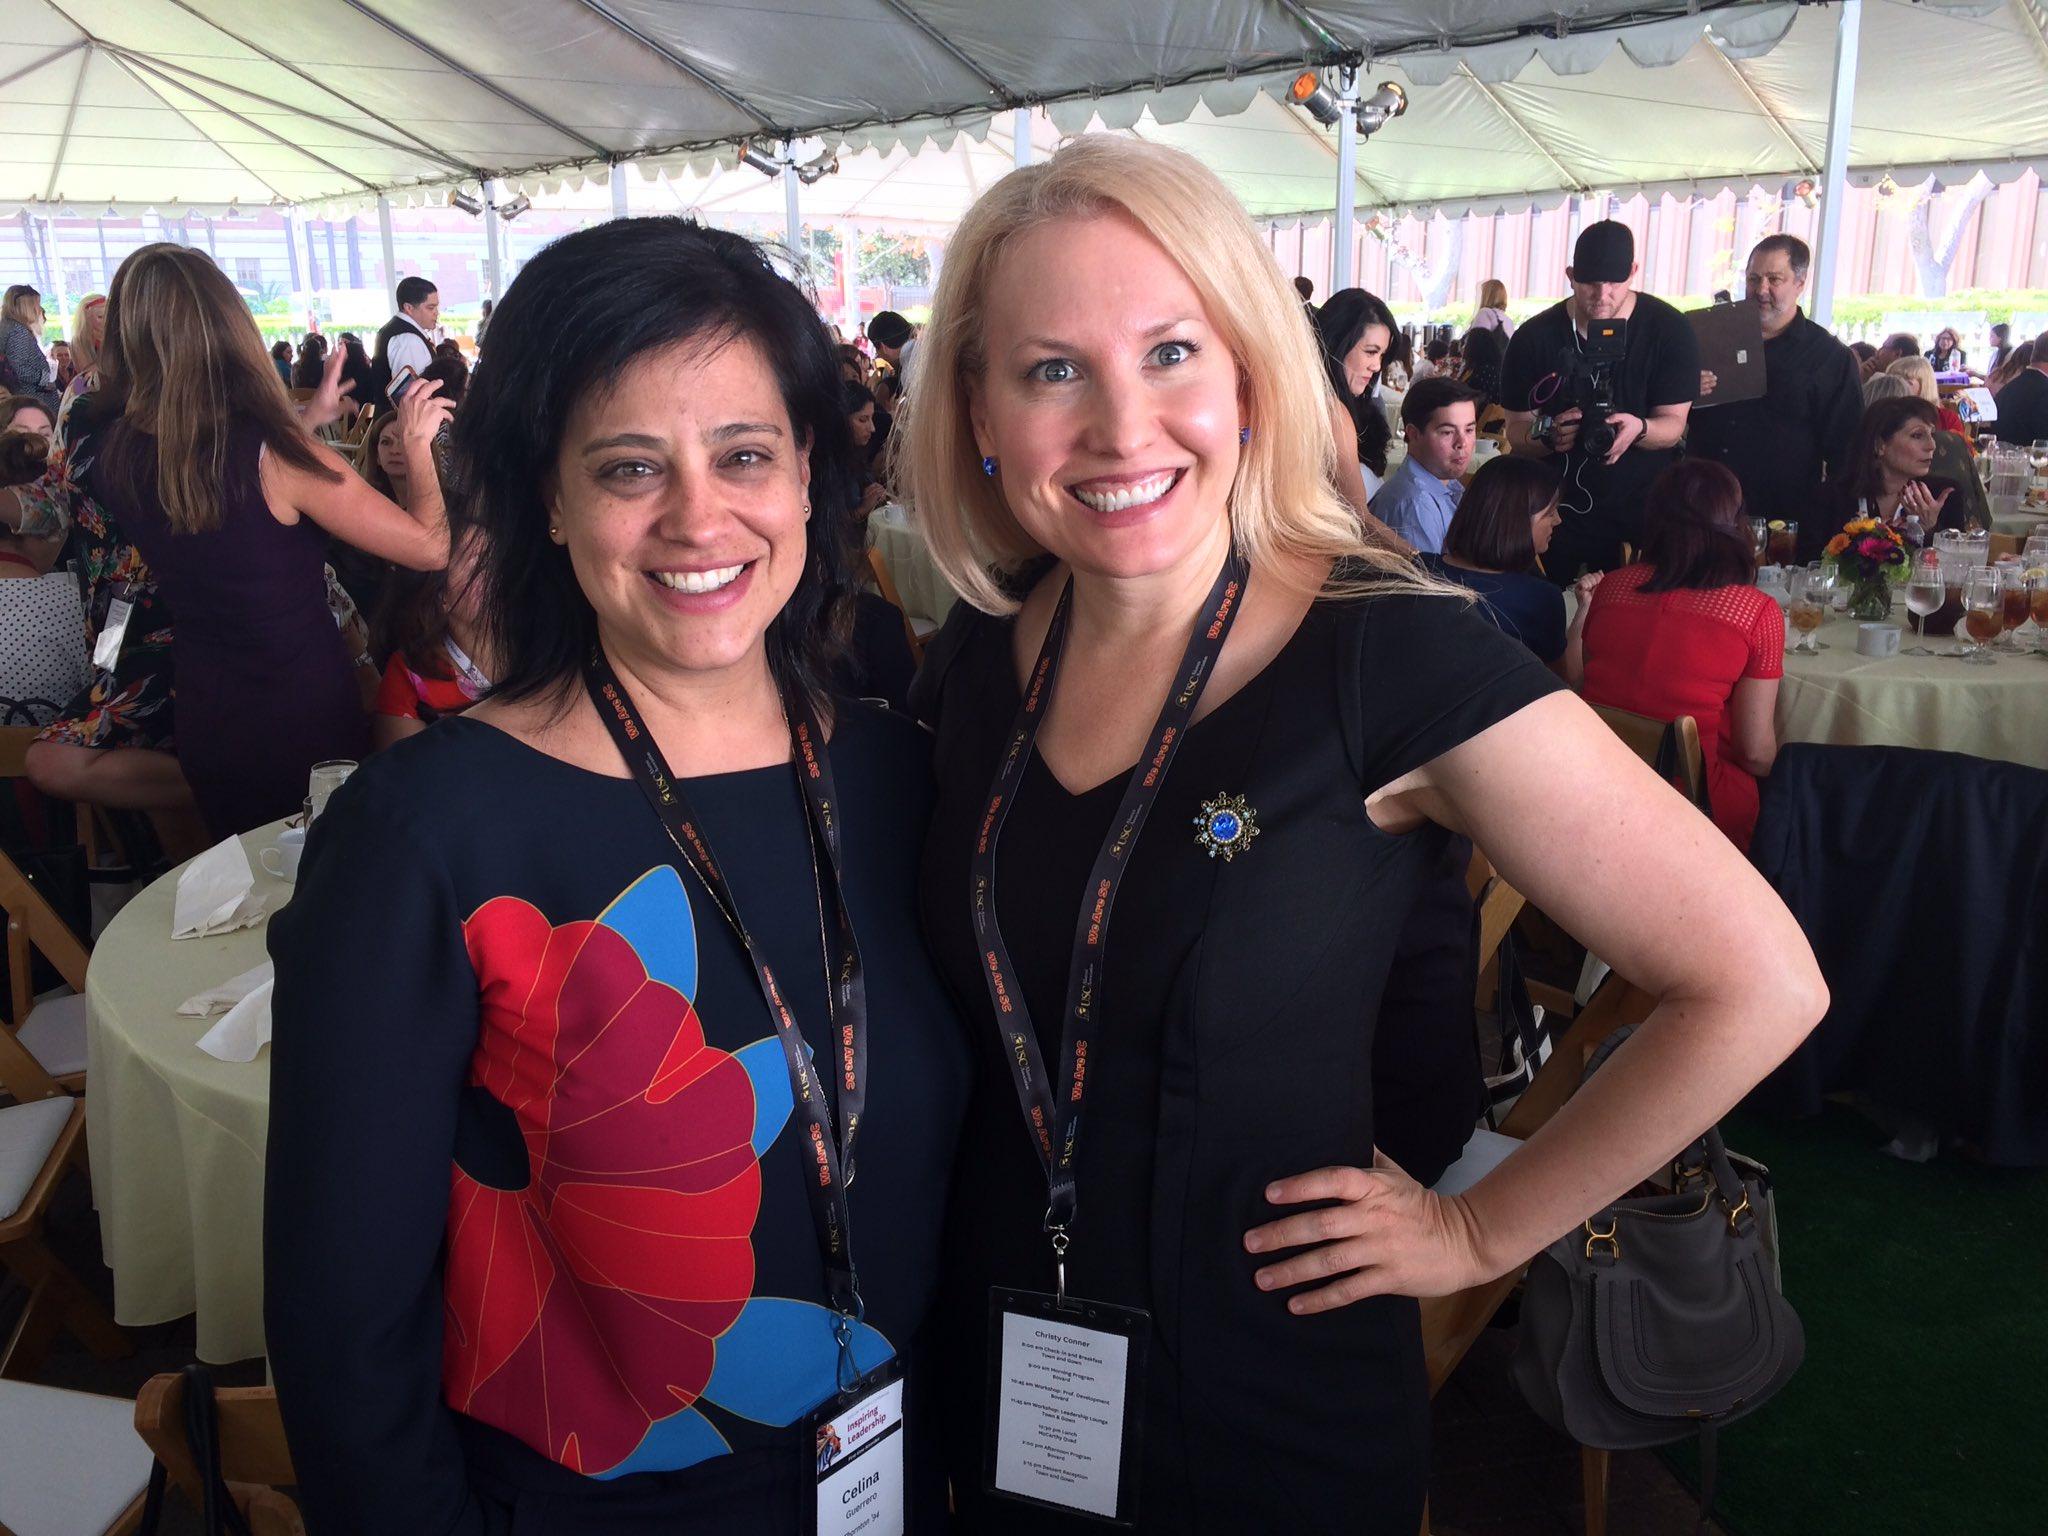 Friday Coffee Meetup ladies @USC Women's Conference 2017 @IPFridayCoffee @_celinaguerrero #USCWC #FightOn @USCAlumni https://t.co/GBFQueLqDs